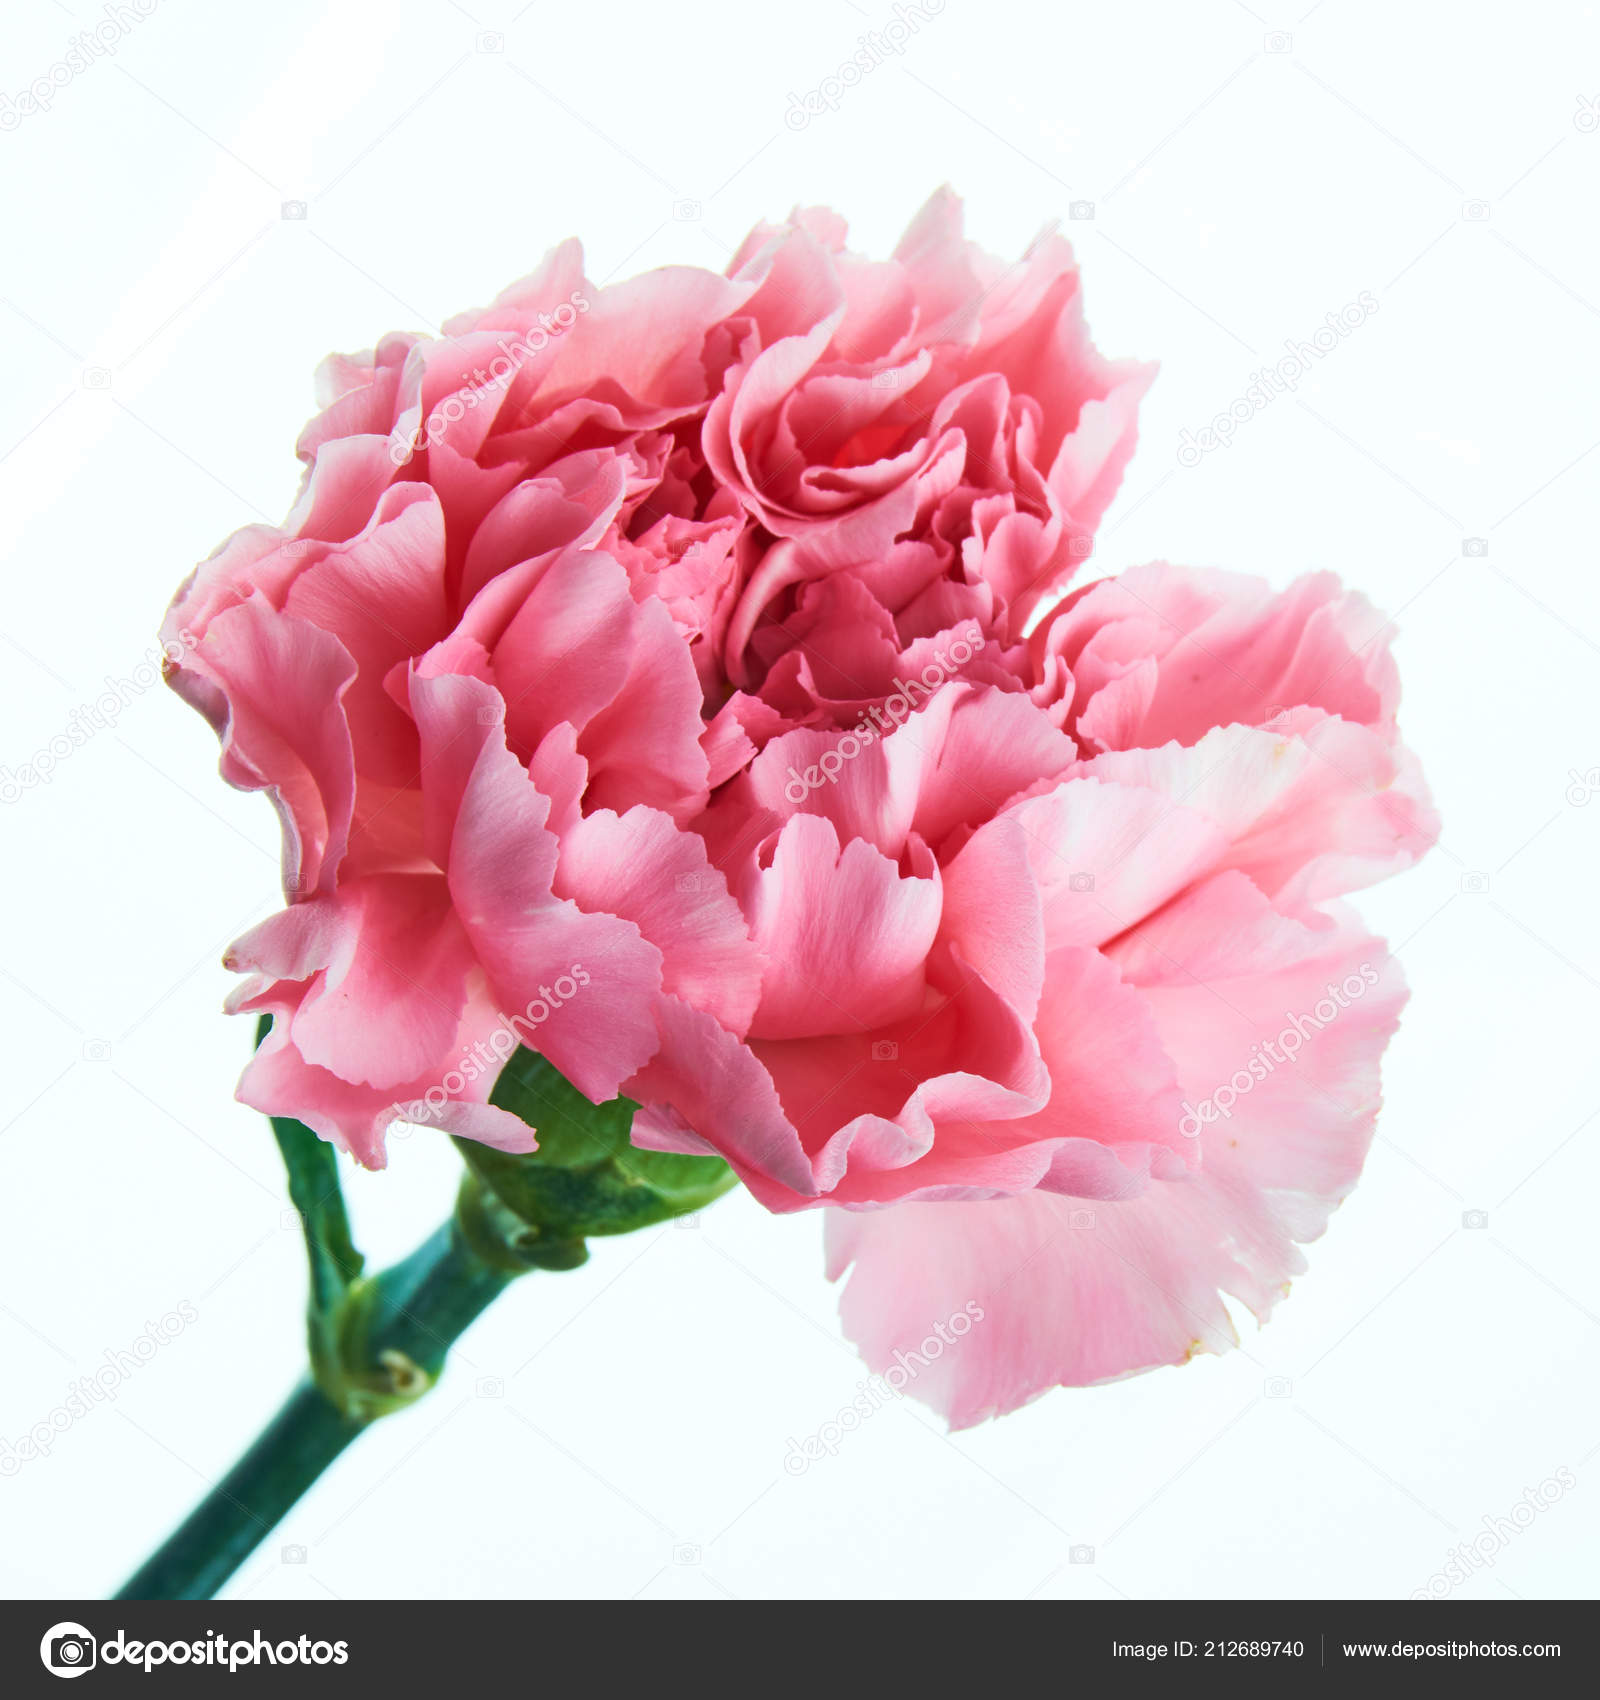 Top Schöne Rosa Nelke Blume Mit Stiel Hautnah — Stockfoto © jan_mach &HU_39